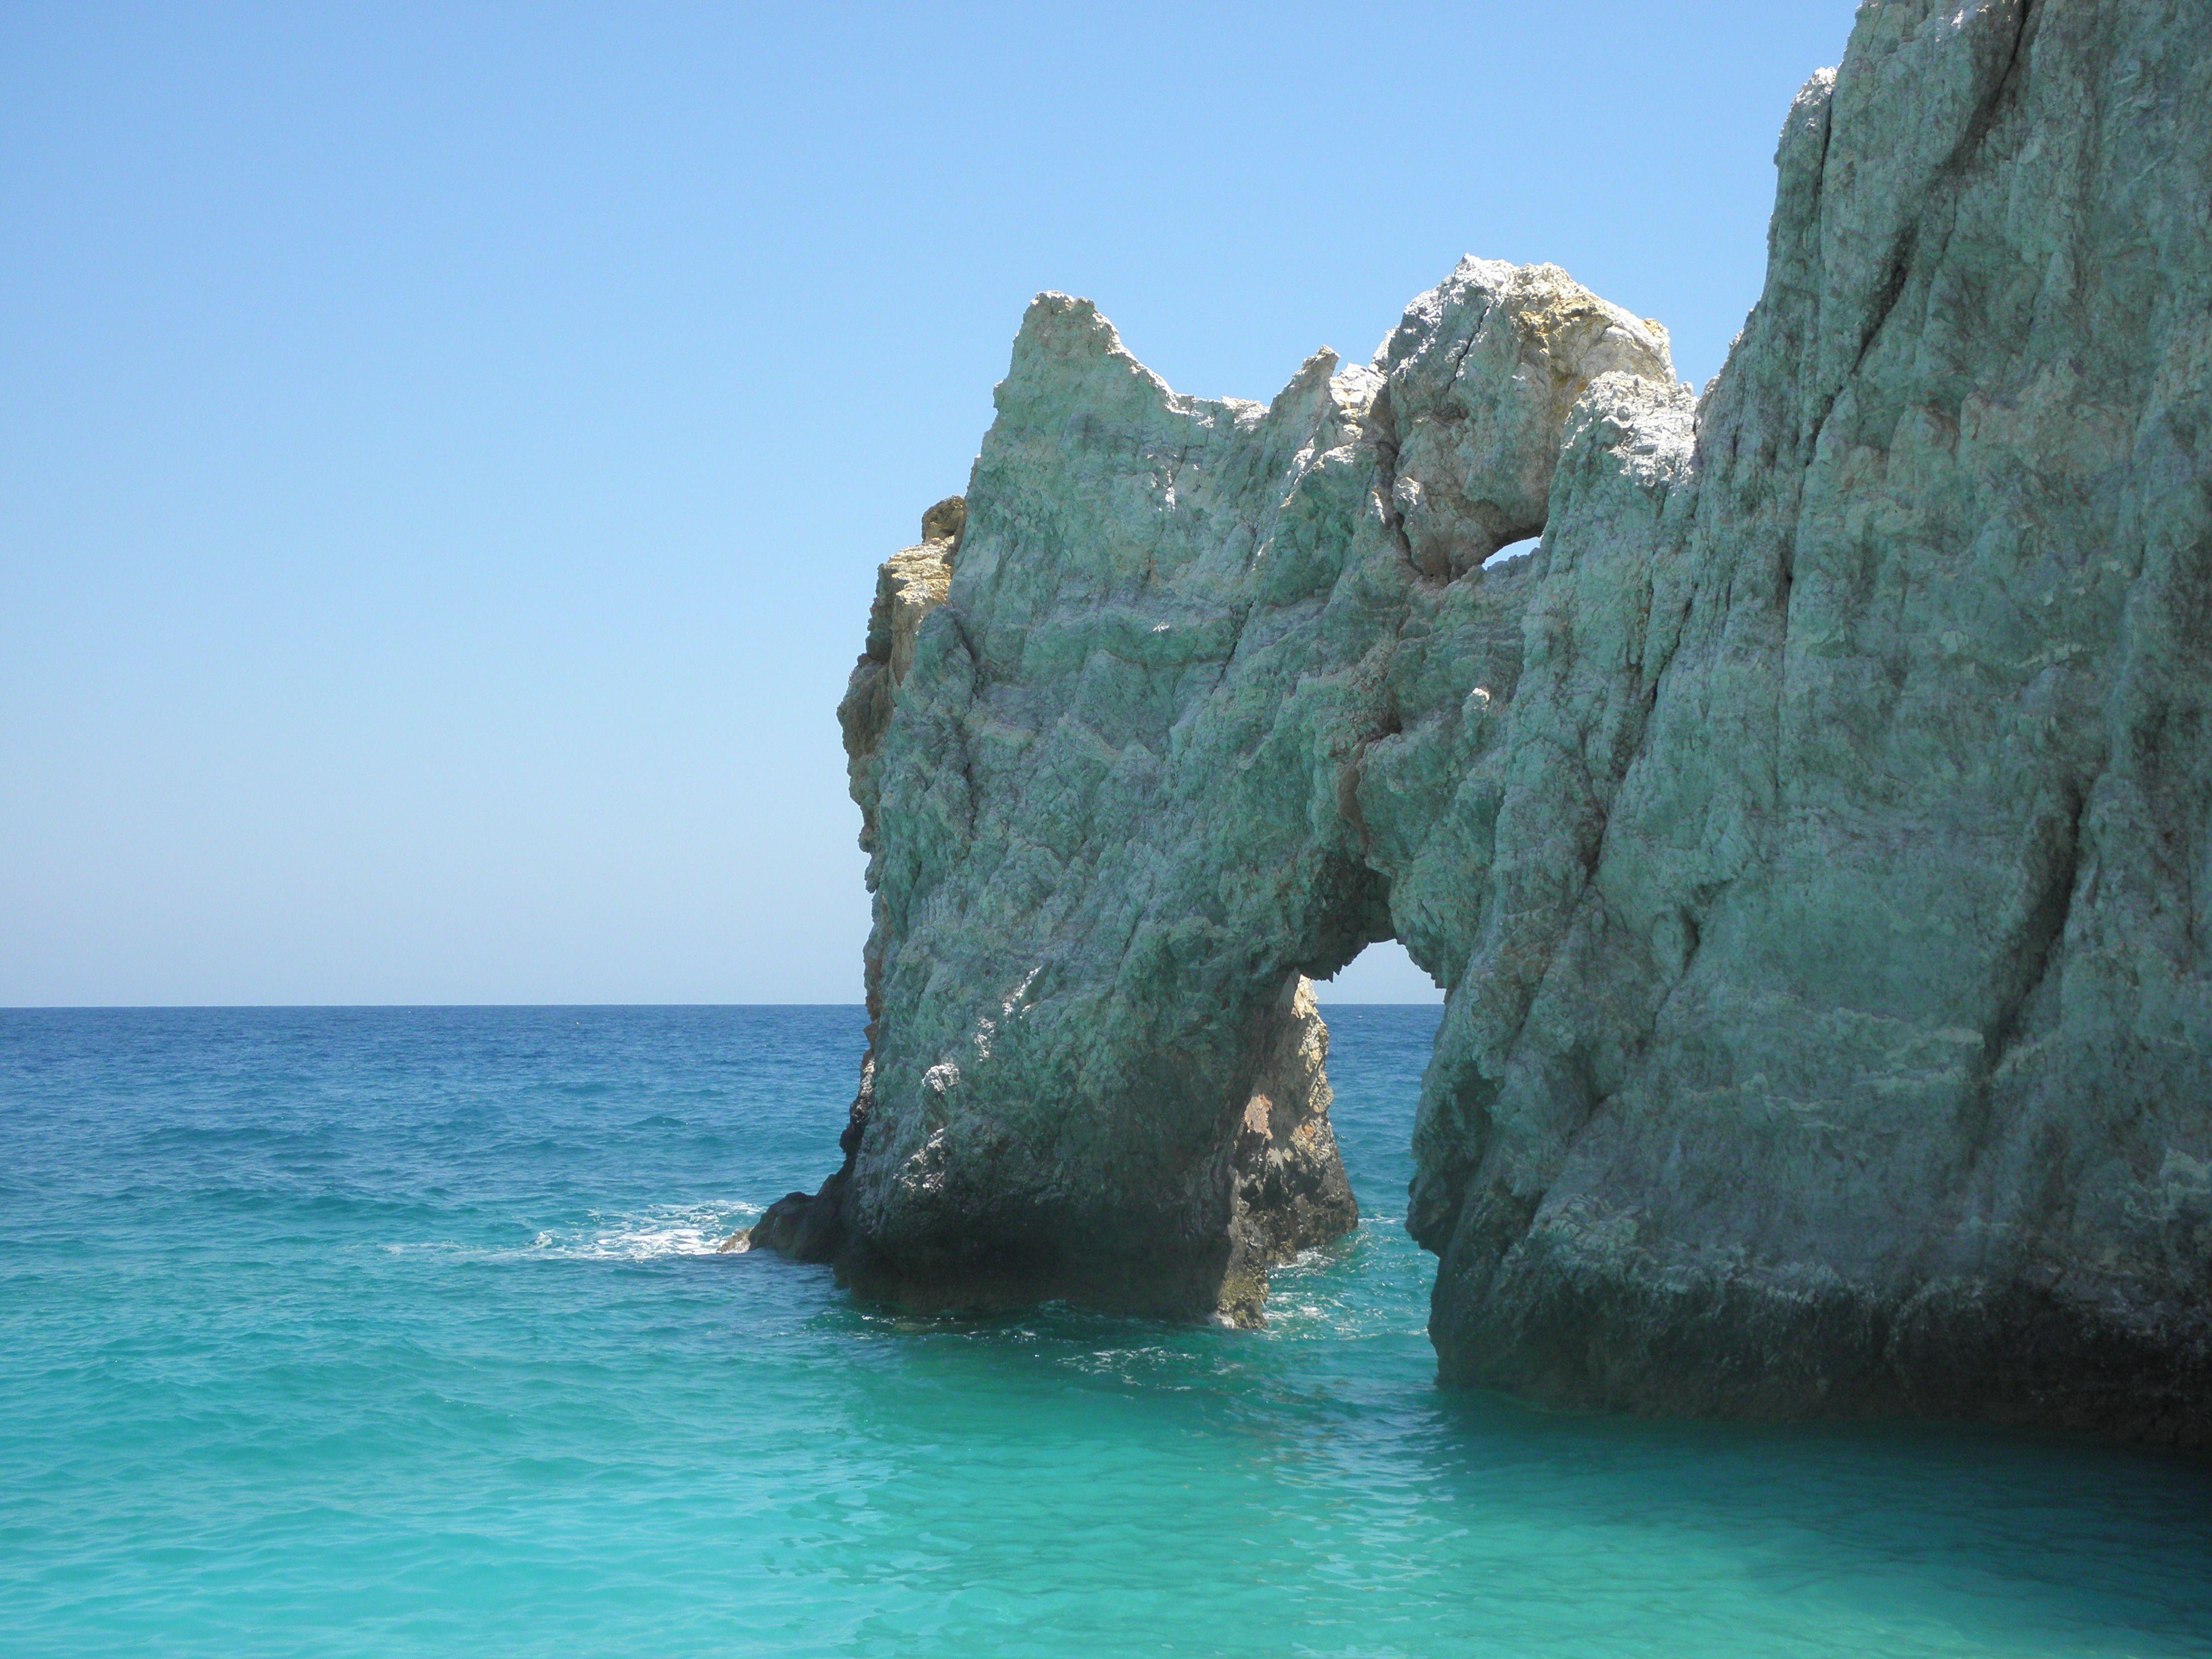 The arch at lalaria beach udududududududududududududududududududud